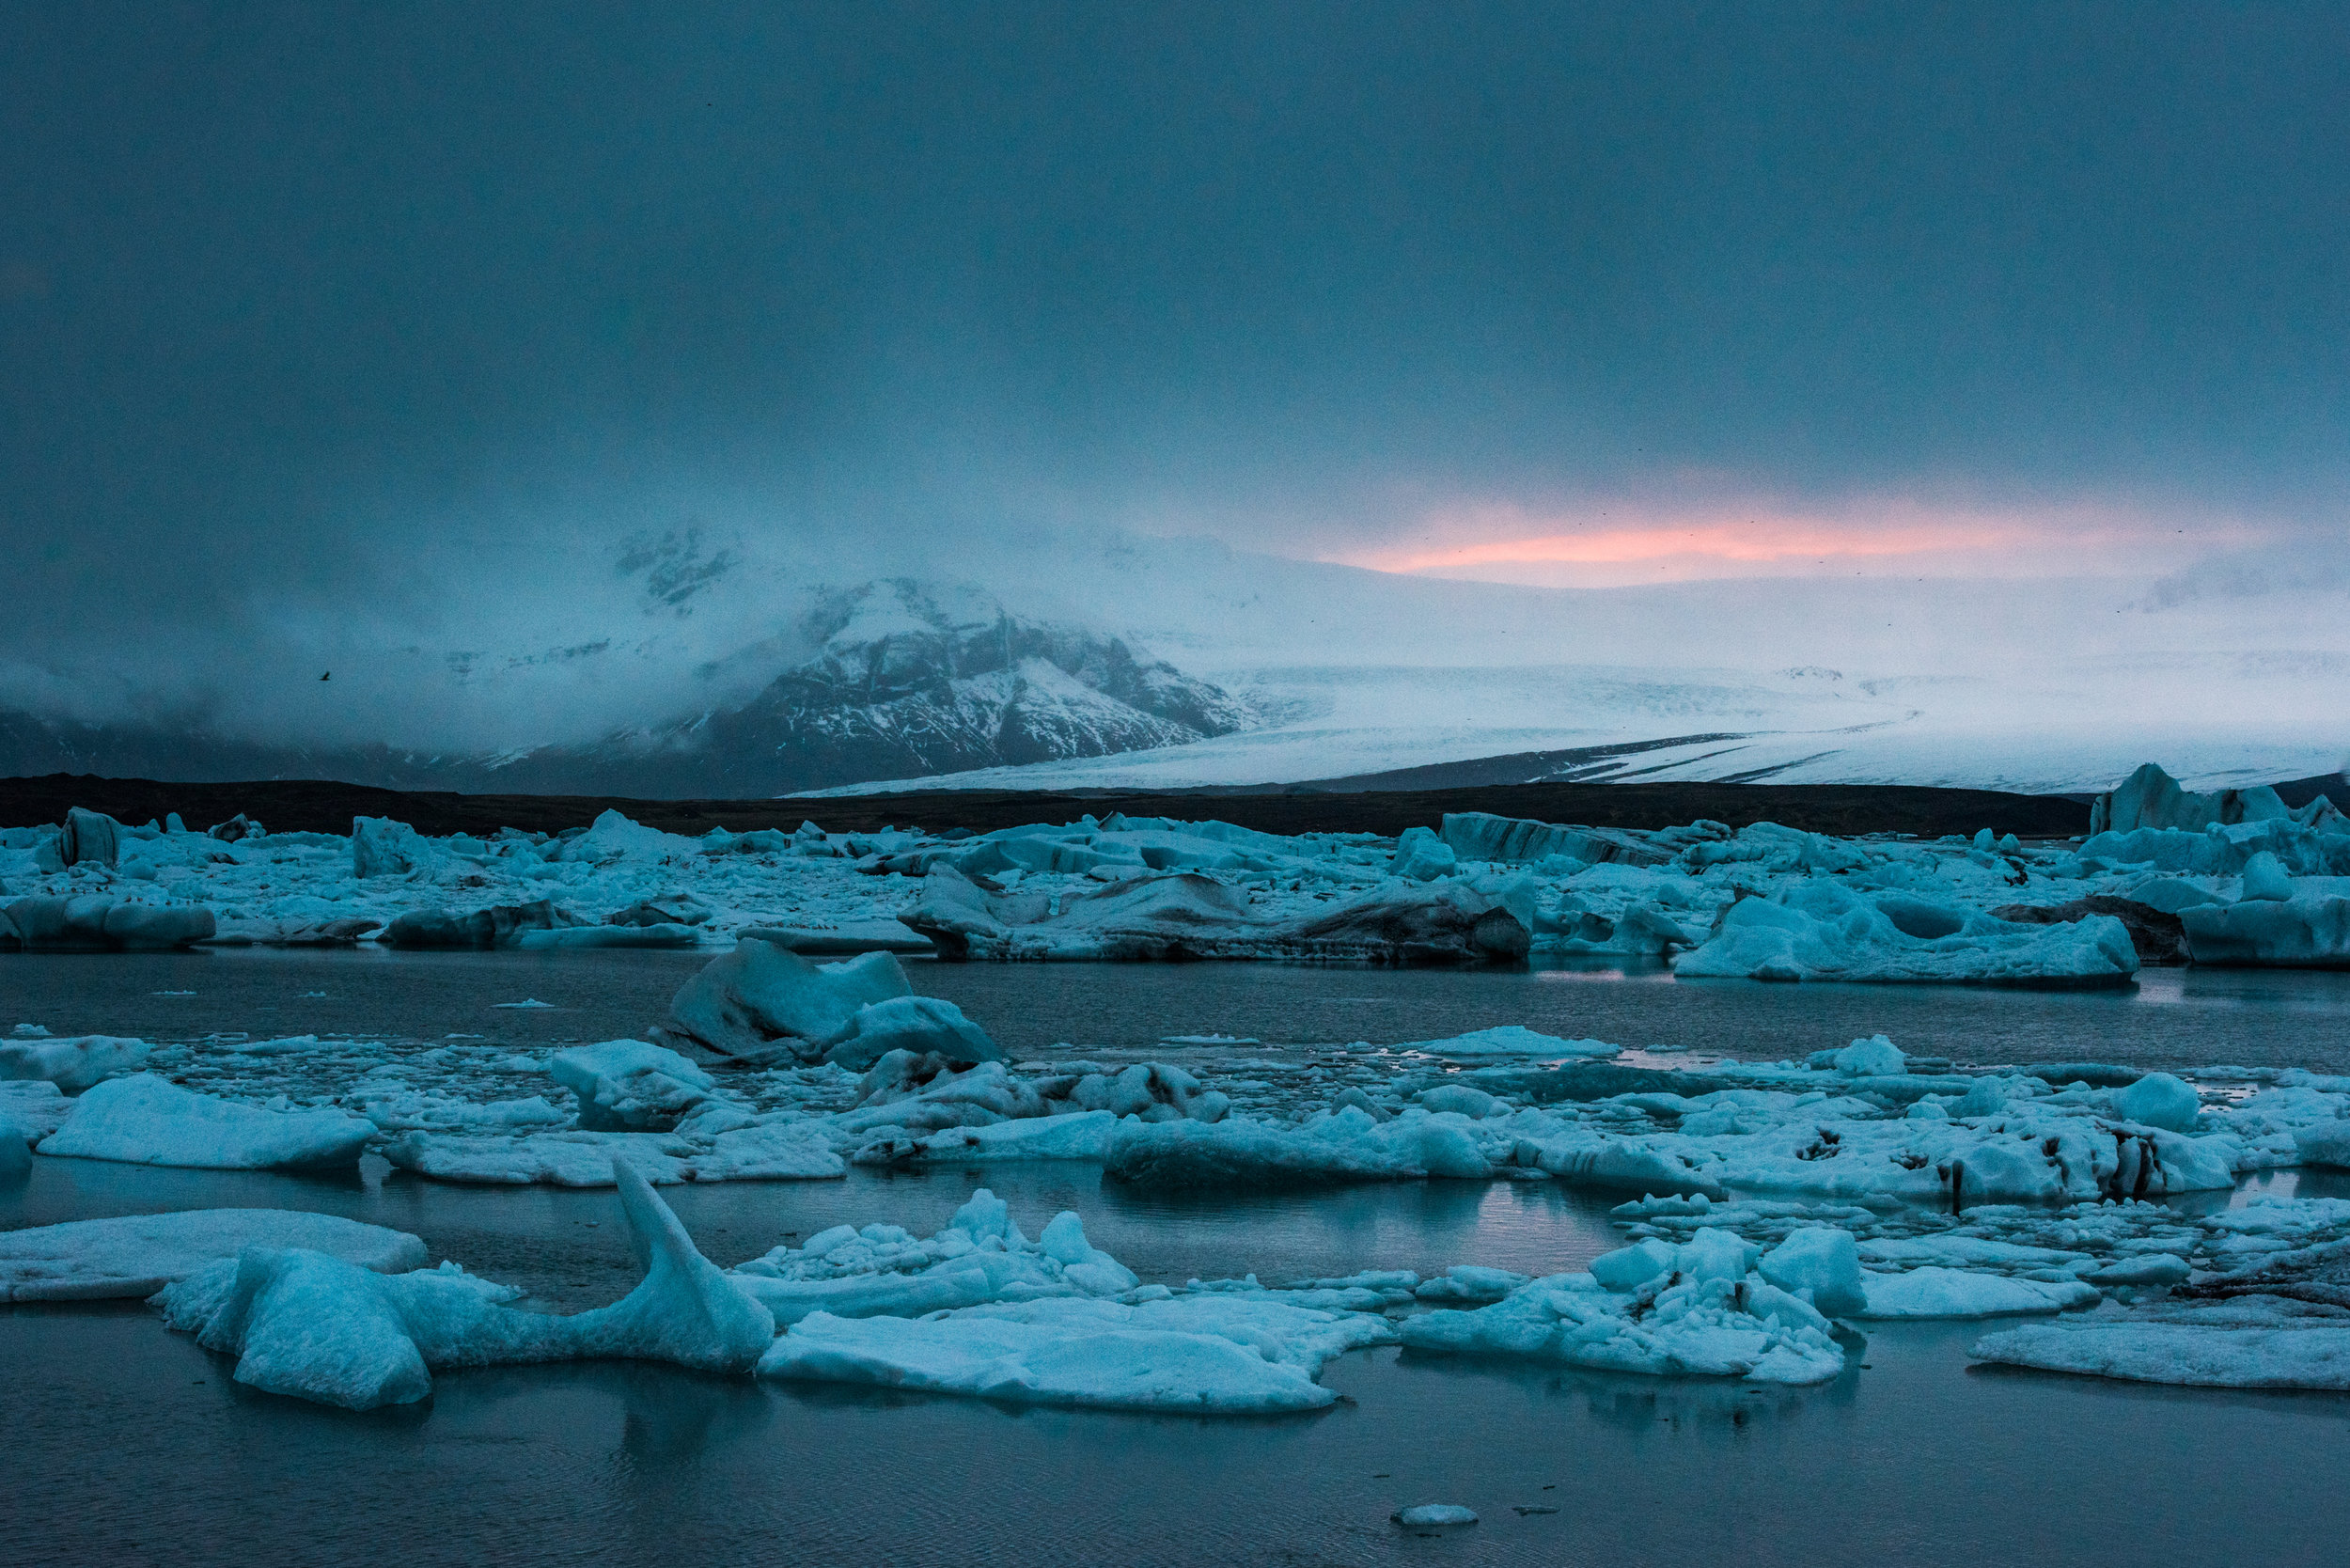 ICELAND_WOMAN_PHOTOGRAPHER_TARASHUPE_OUTDOOR_PHOTOGRAPHY_088.jpg